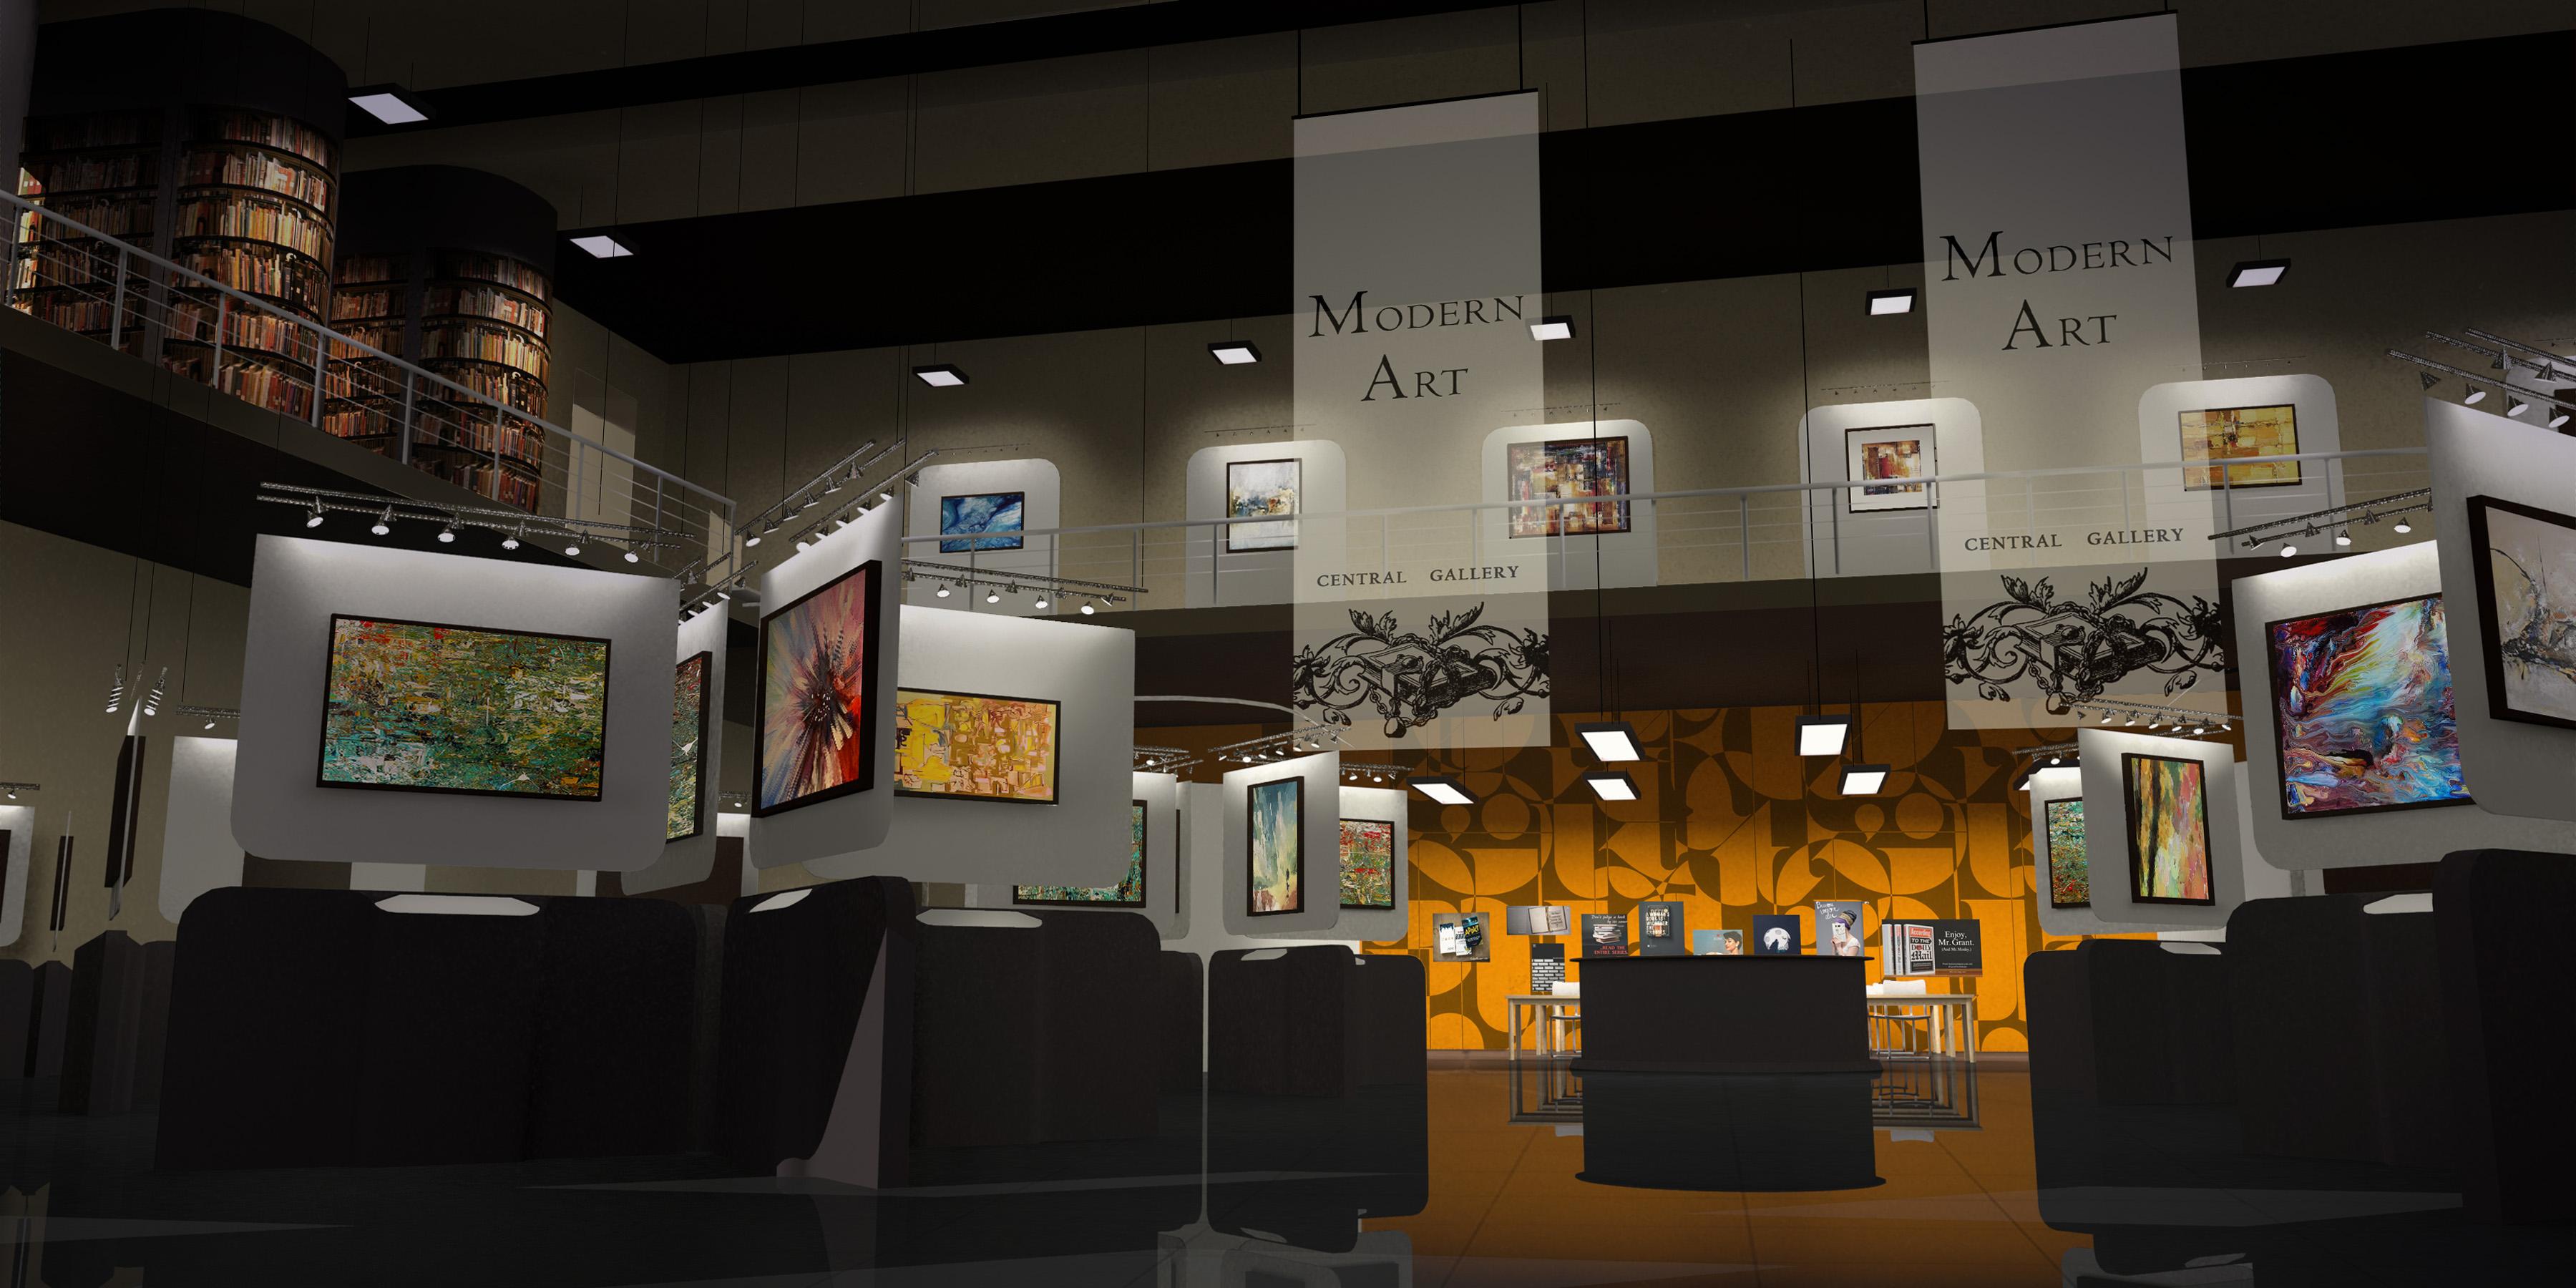 VZ-Identity-library-interior-03.jpg